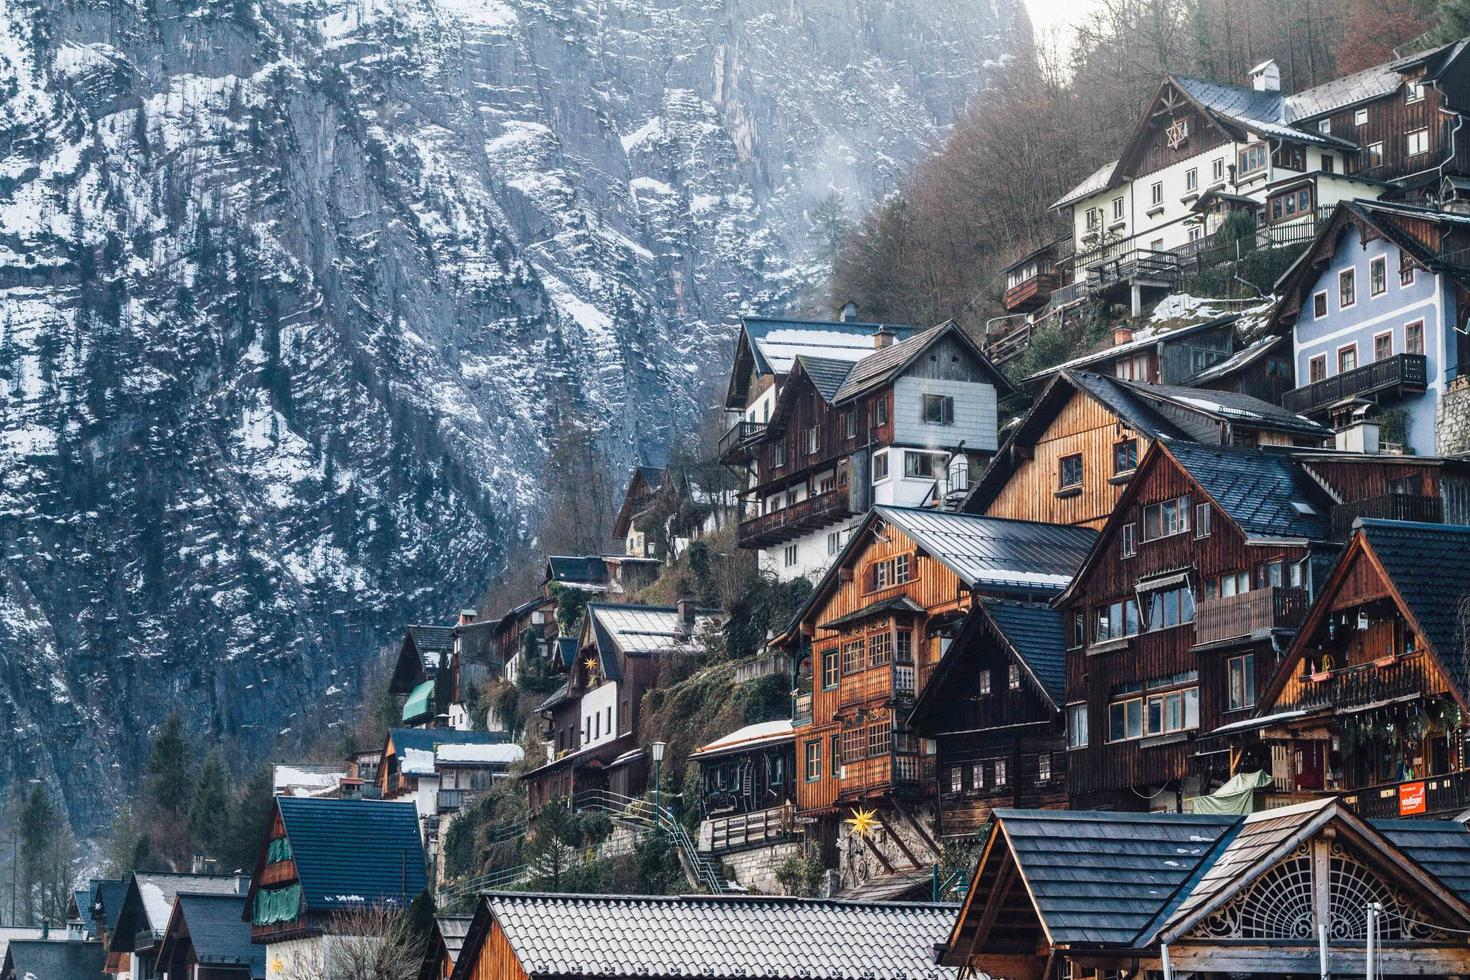 Wooden houses on mountain photo